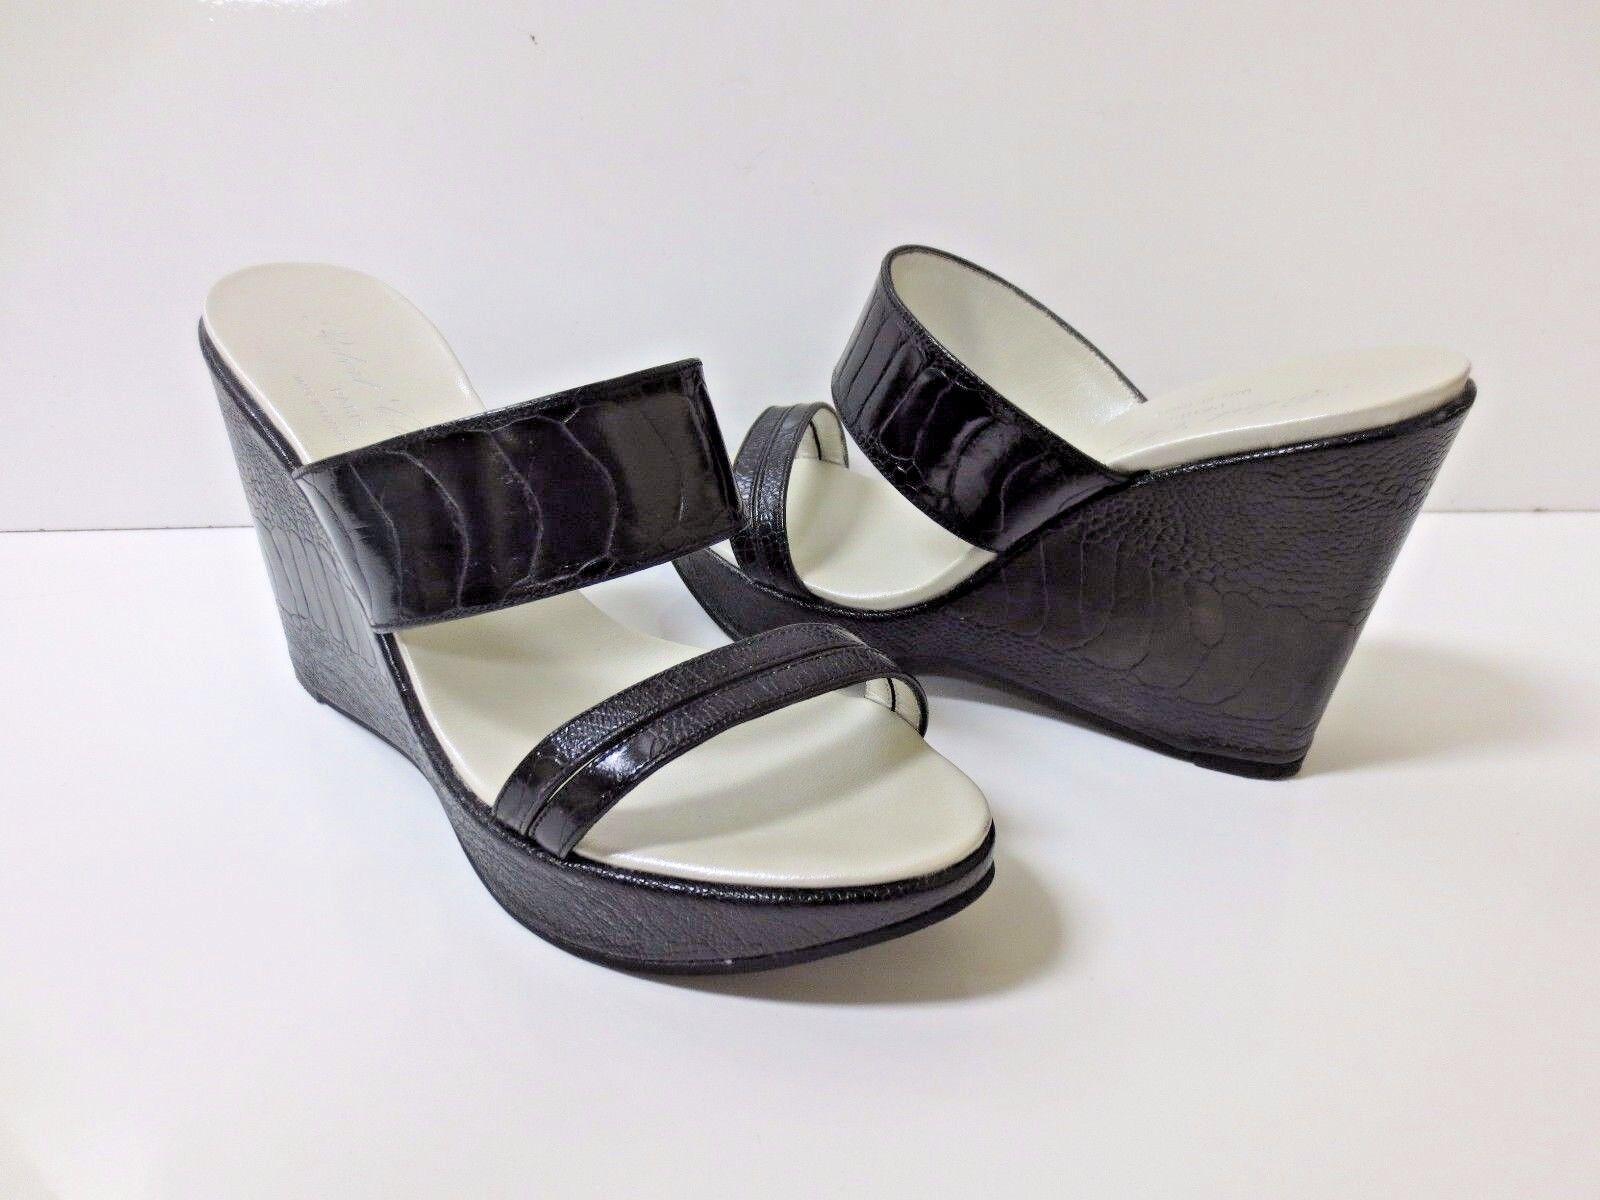 ROBERT CLERGERIE Black Reptile Embossed Leather Double Strap Sandals shoes shoes shoes 7 EUC 01152d